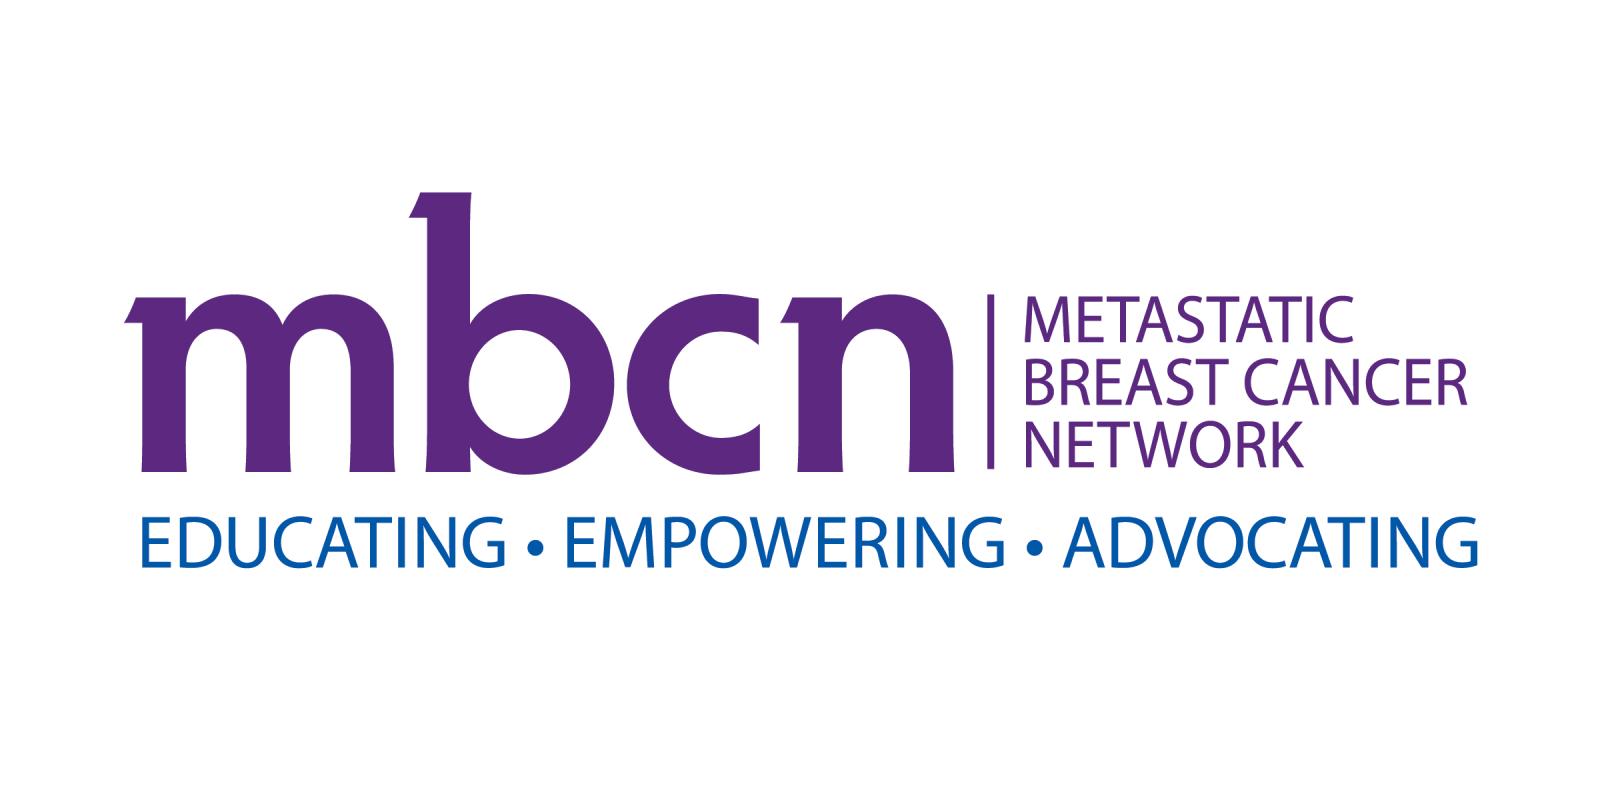 Sap Partners   Advocacy   <b>Metastatic Breast Cancer Network </b>